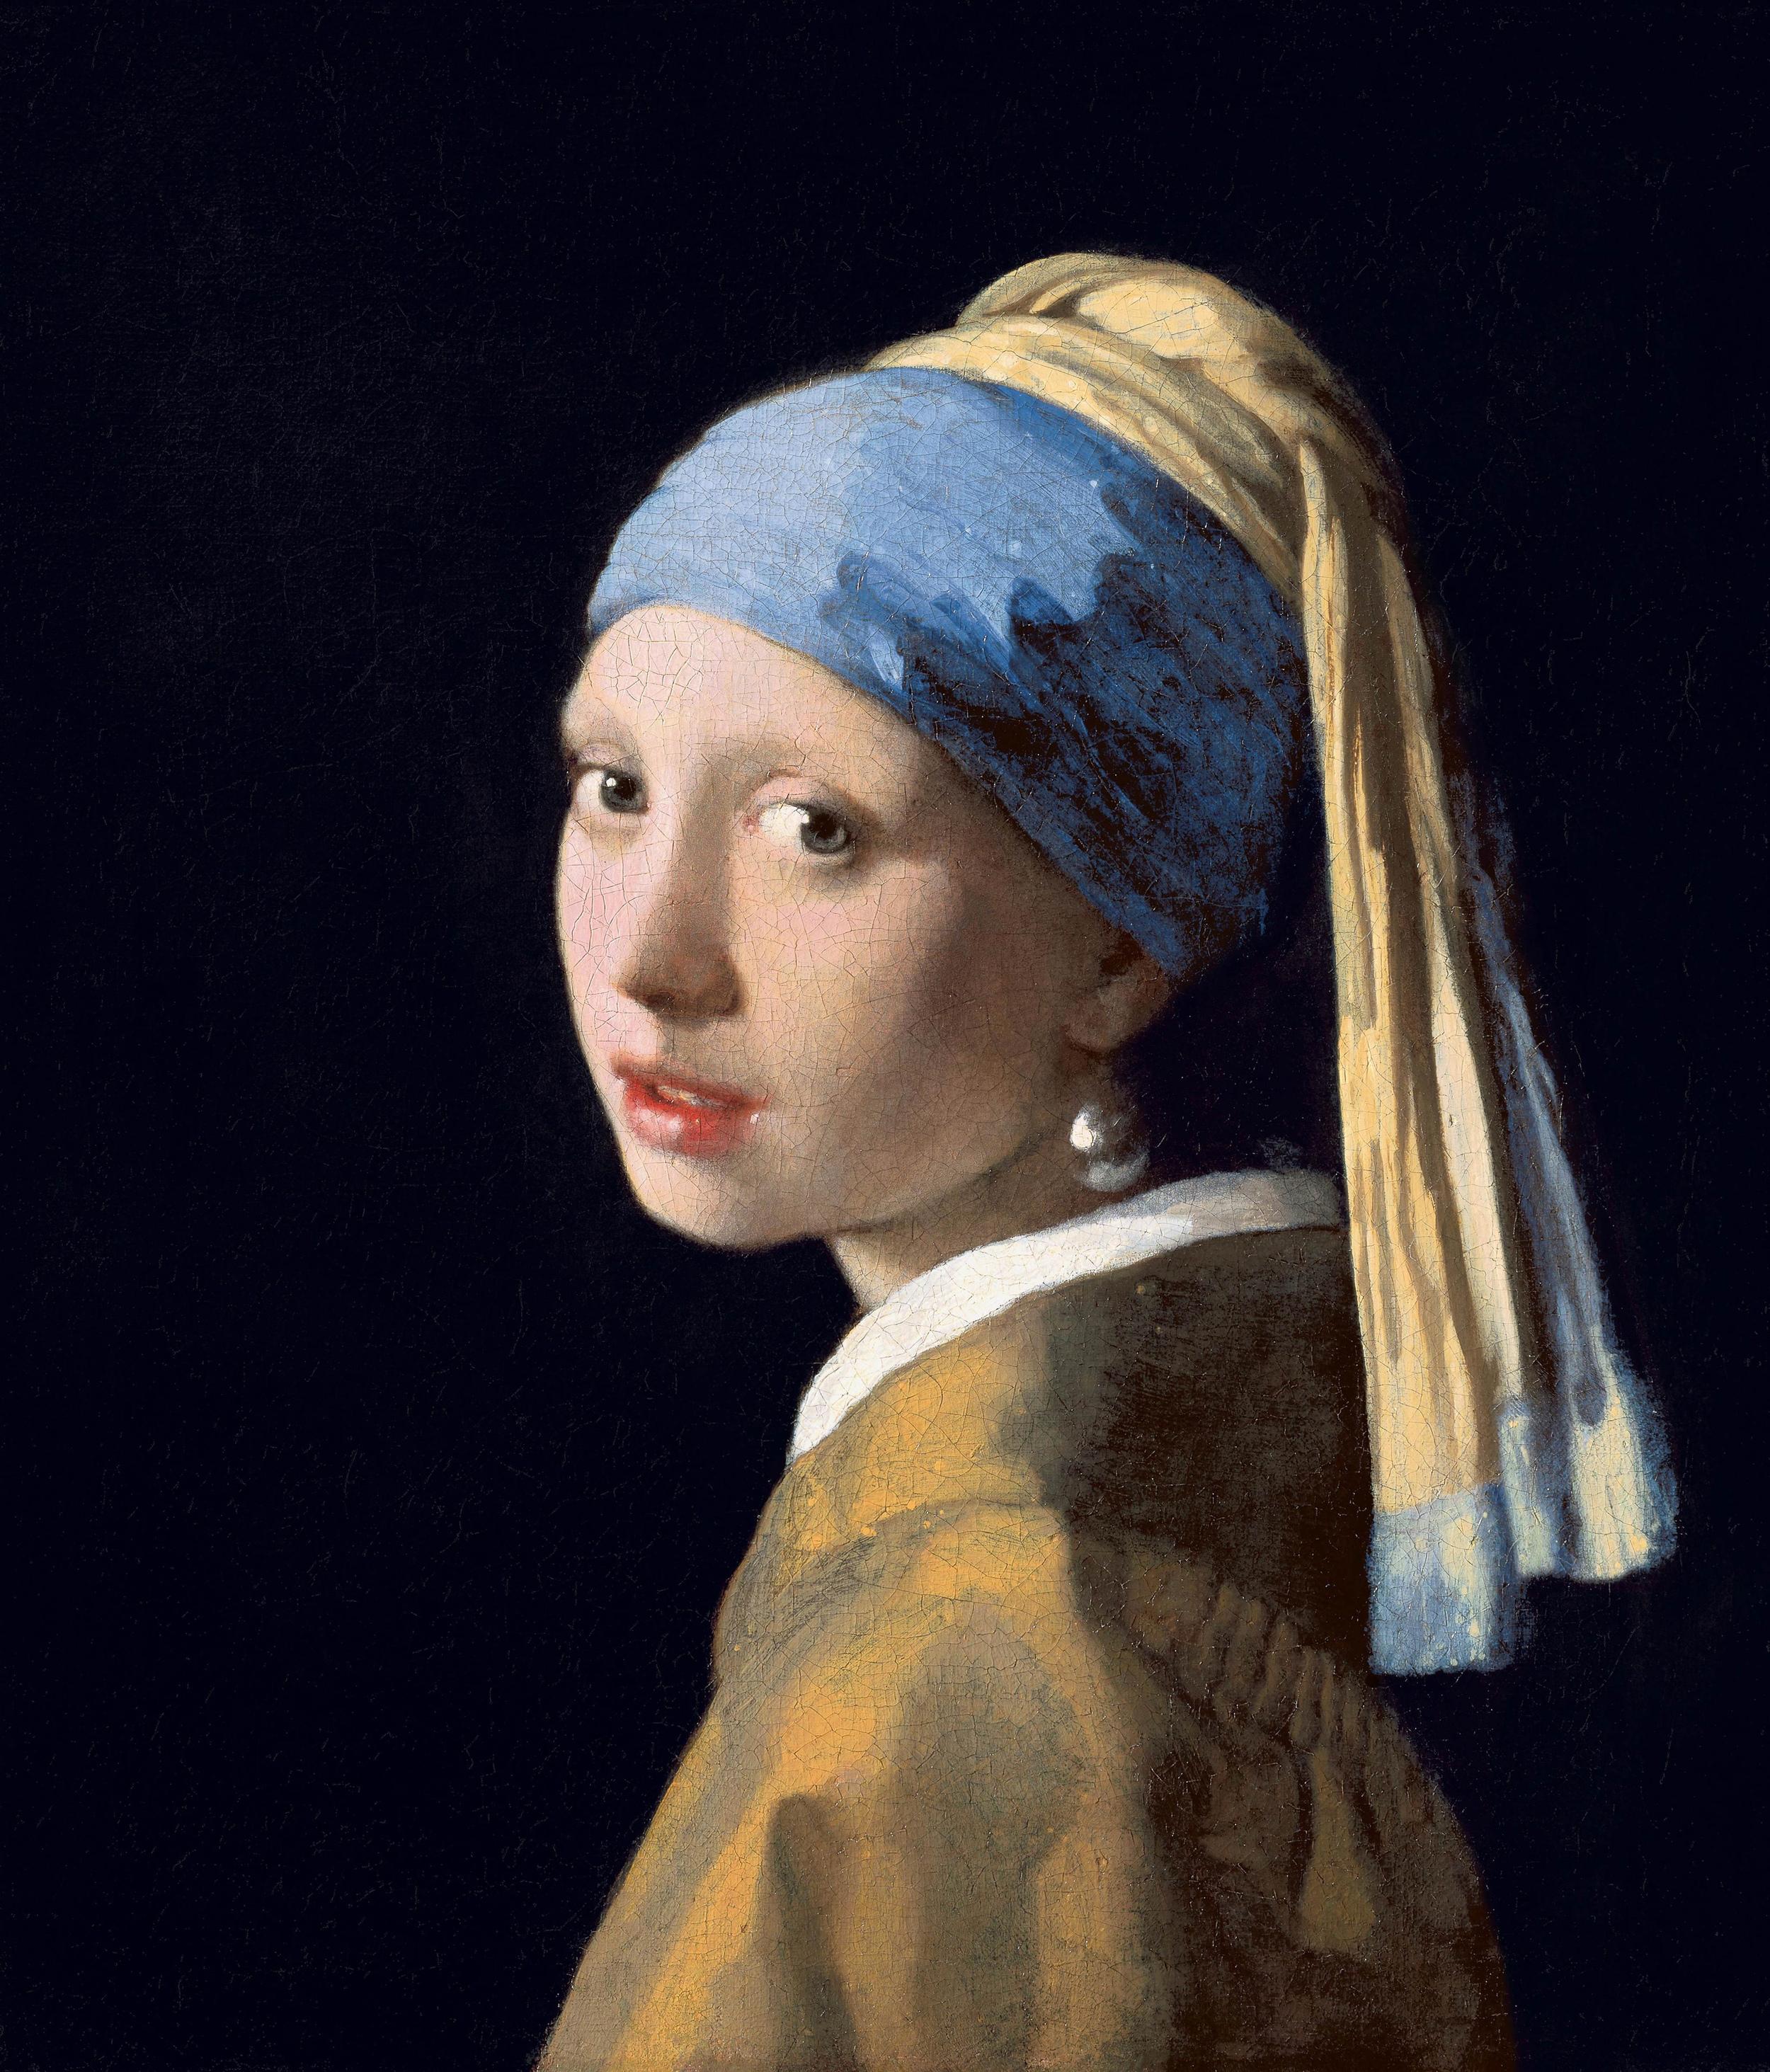 Johannes Vermeer, Girl With A Pearl Earring, 1665, Oil on canvas